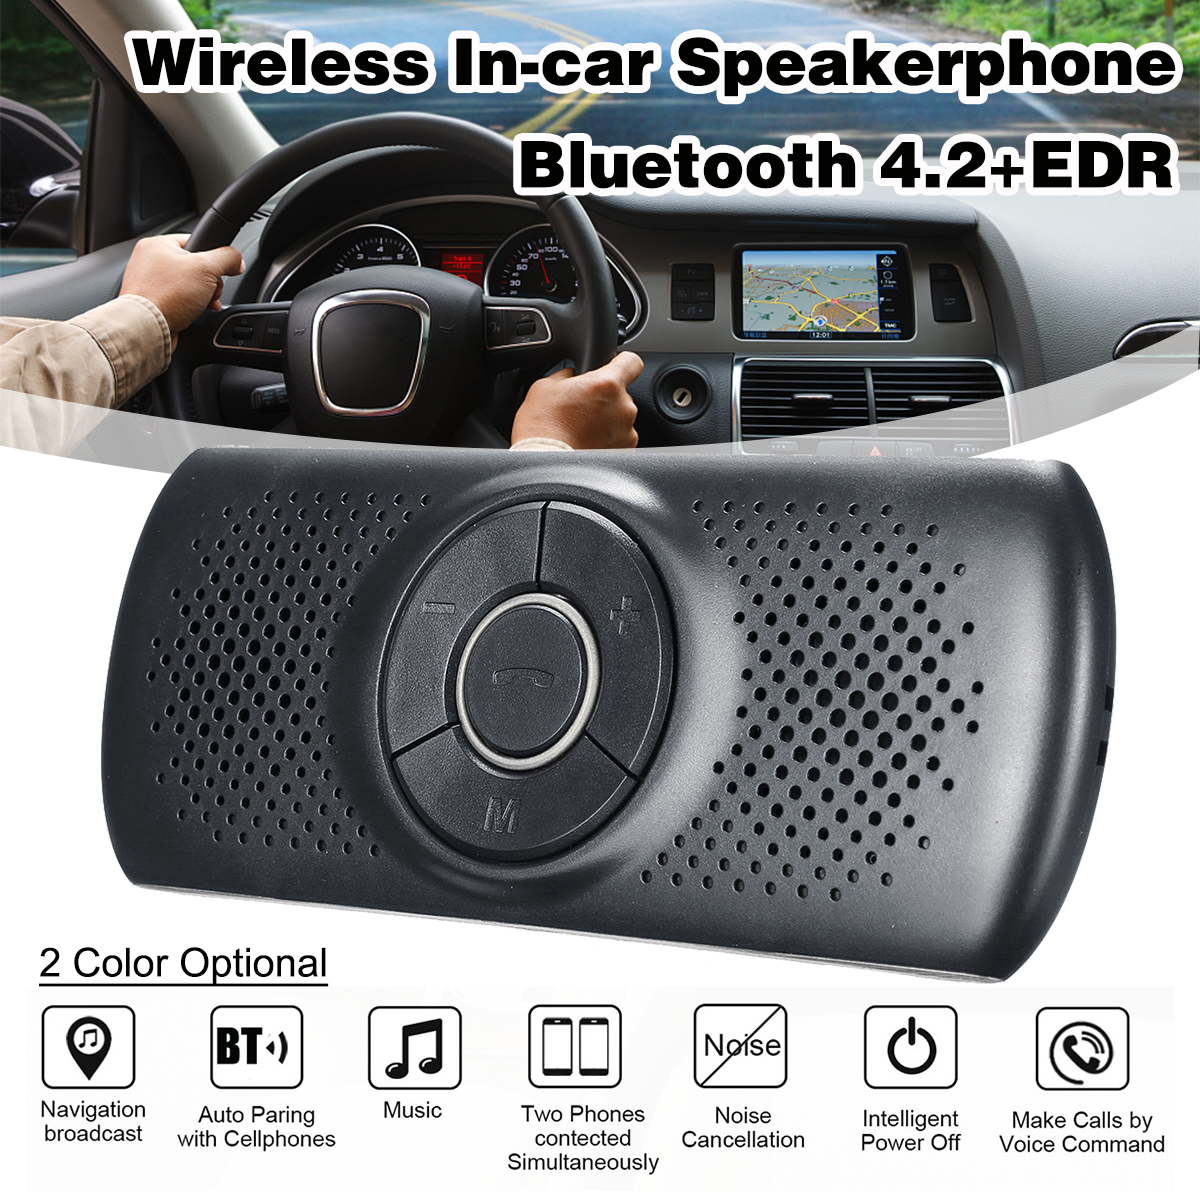 Wireless bluetooth Car Kit Set Handsfree Speakerphone Multipoint Sun Visor Speaker For Phone Smartphones Car Charger Hands Free